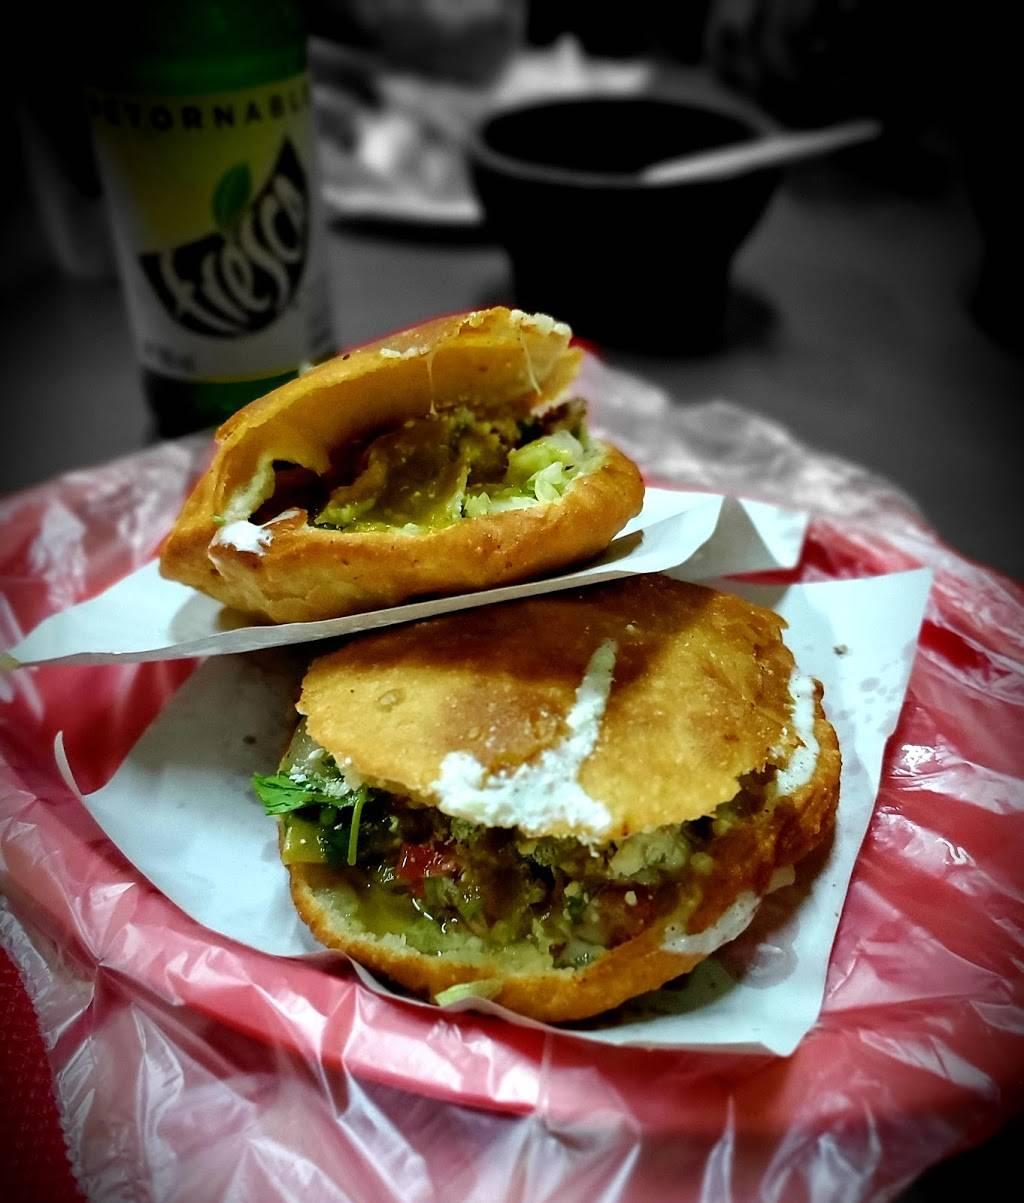 Super Gorditas | restaurant | Laurel 9955, El Florido 1ra y 2da Secc, Tijuana, B.C., Mexico